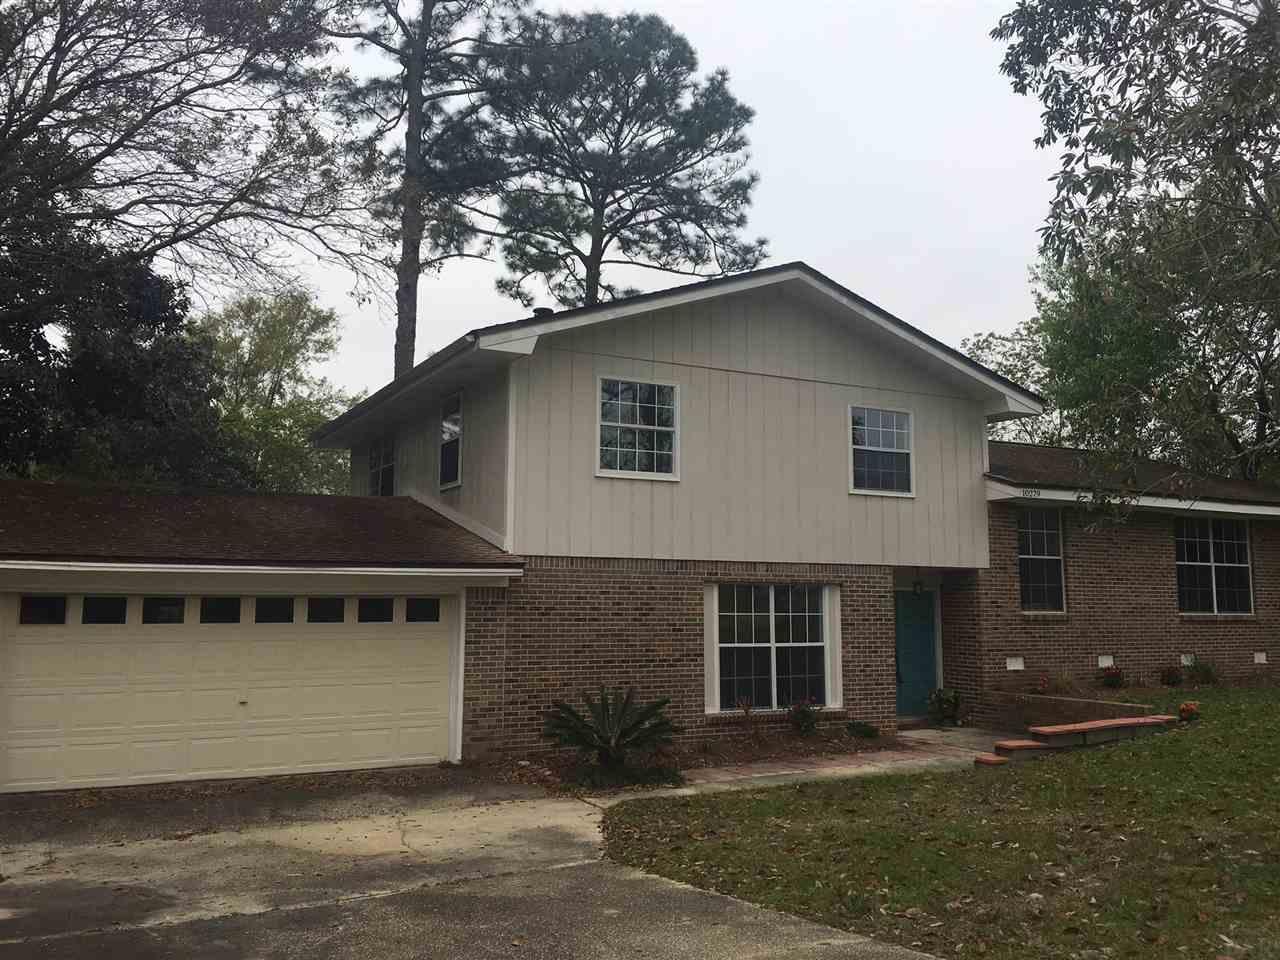 10279 Sugar Creek Dr, Pensacola, FL 32514